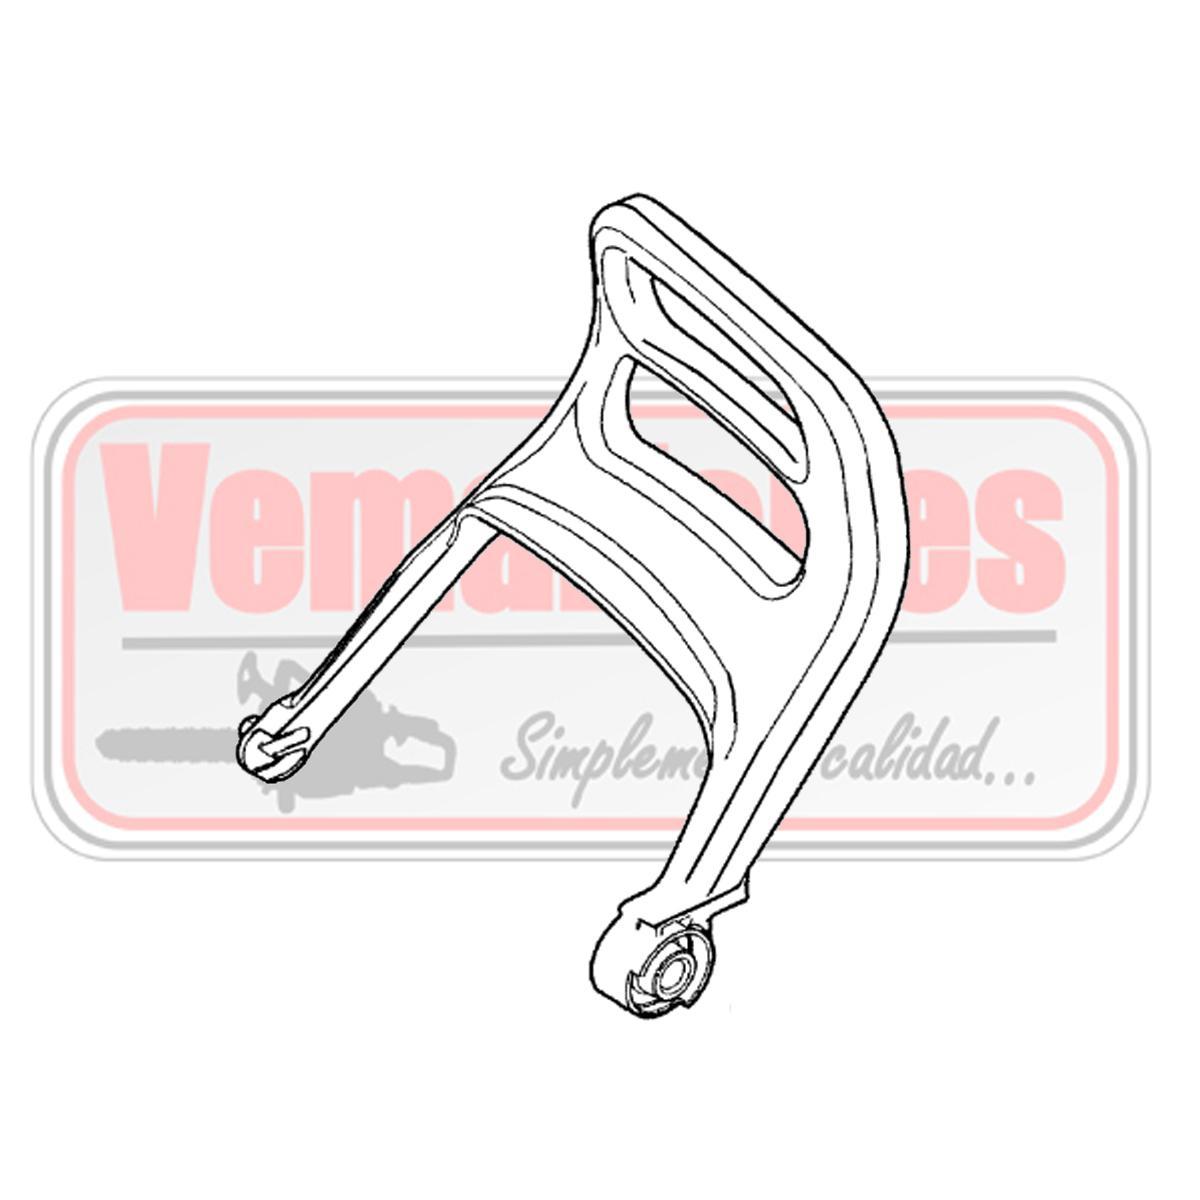 Palanca de freno / protector Oleo Mac GS 350 C / 35.